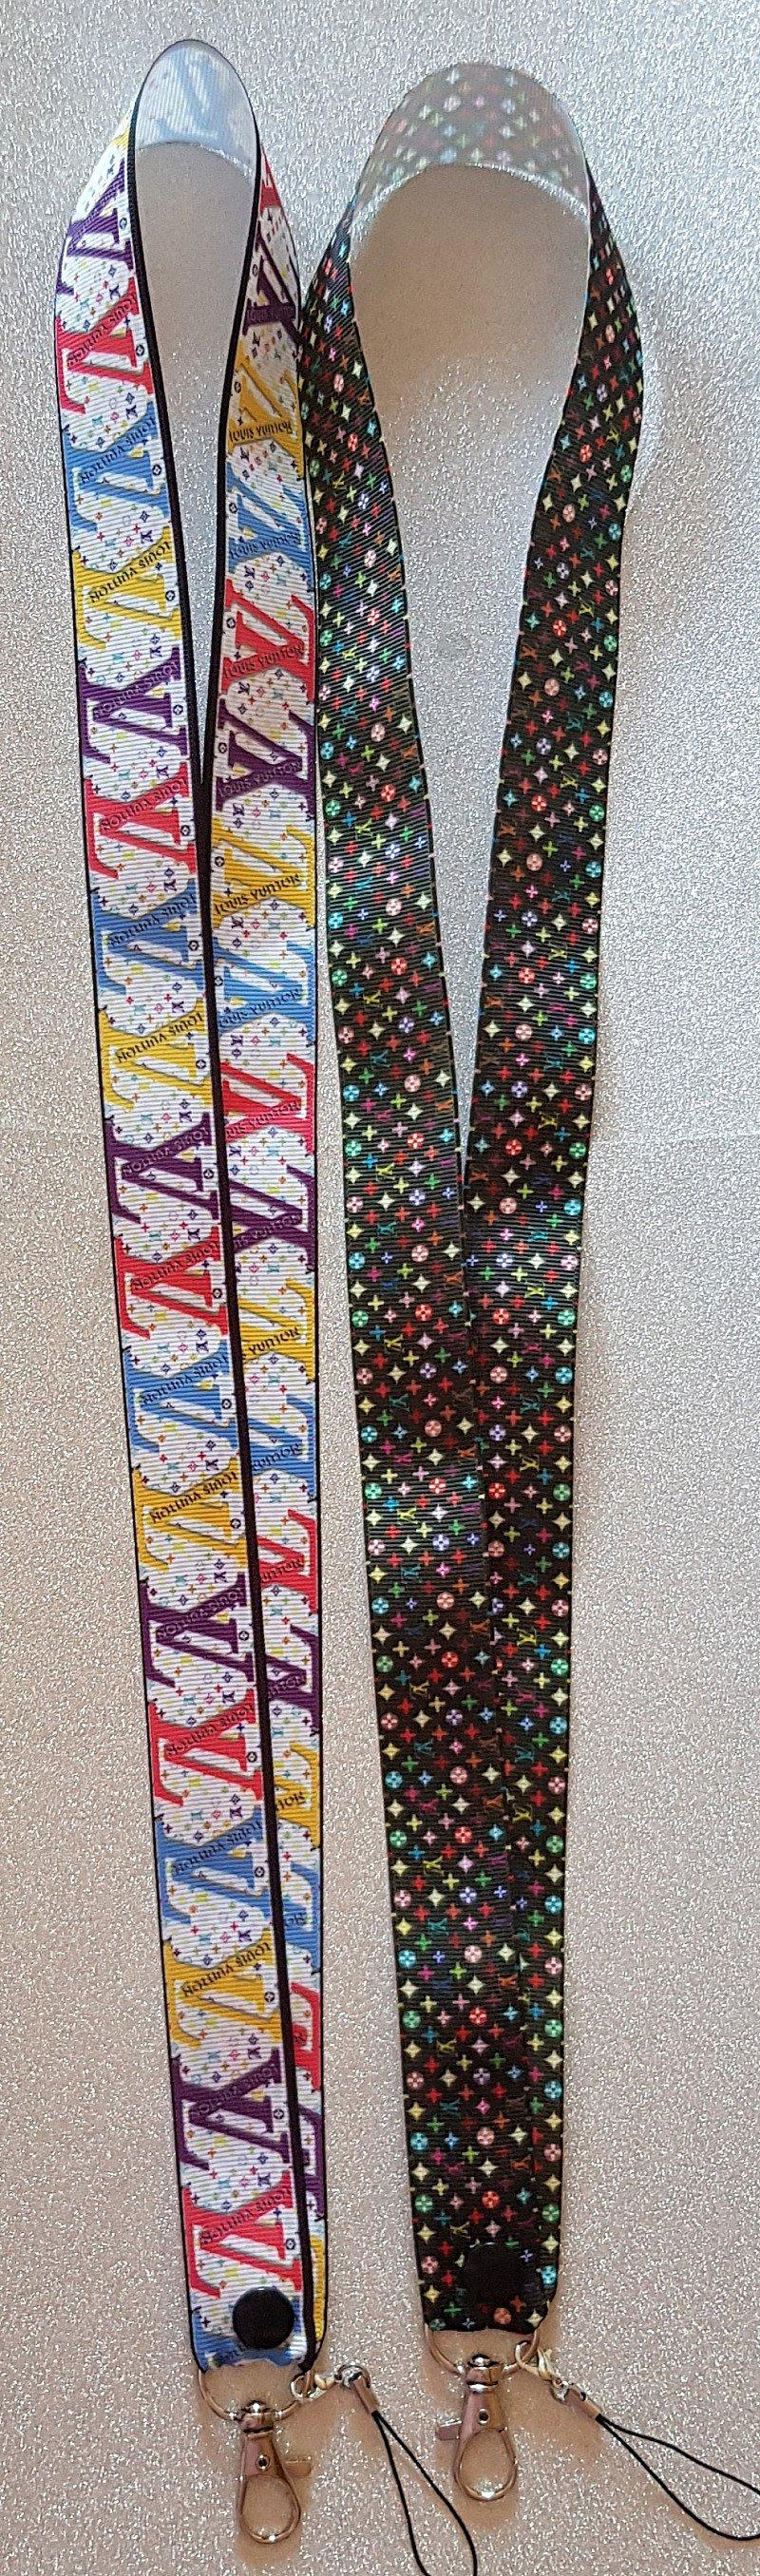 Louis Vuitton Lanyard Id Badge Holders